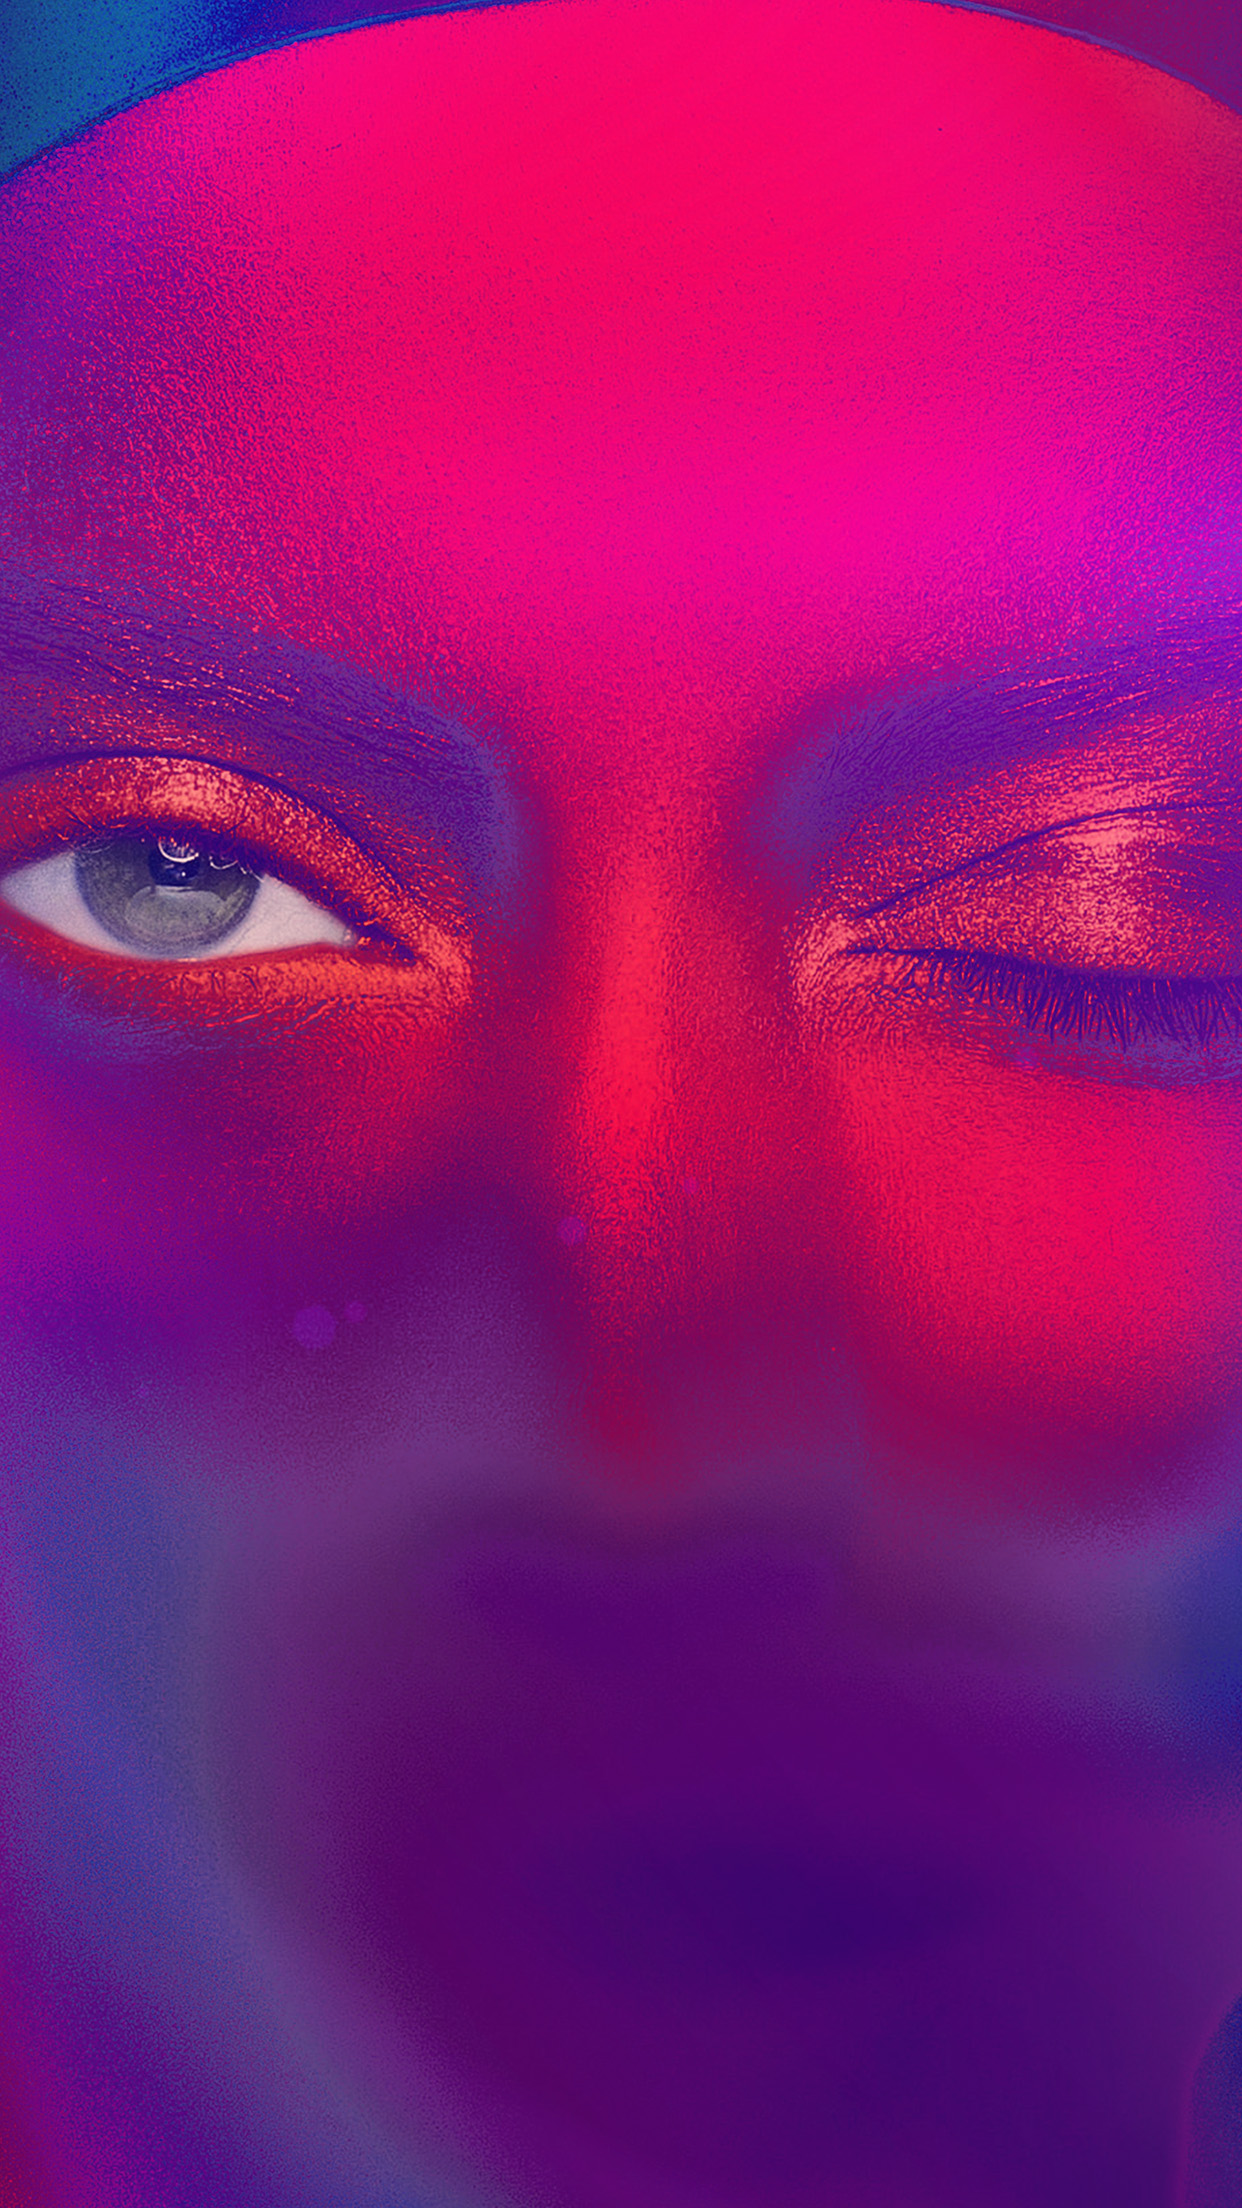 az20-eye-rainbow-color-illustration-art-flare-wallpaper